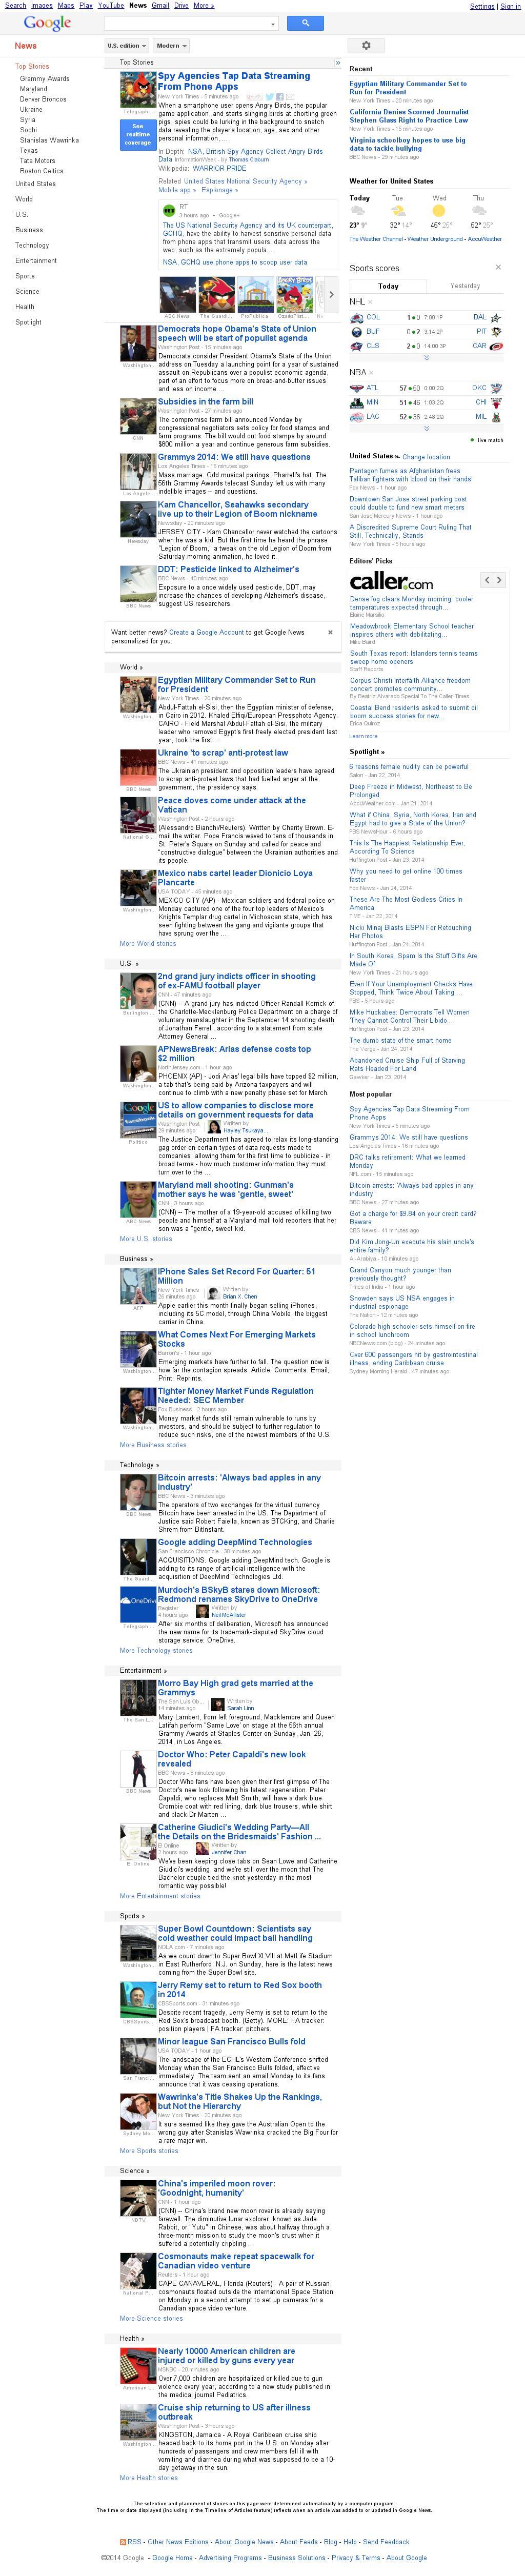 Google News at Tuesday Jan. 28, 2014, 2:07 a.m. UTC